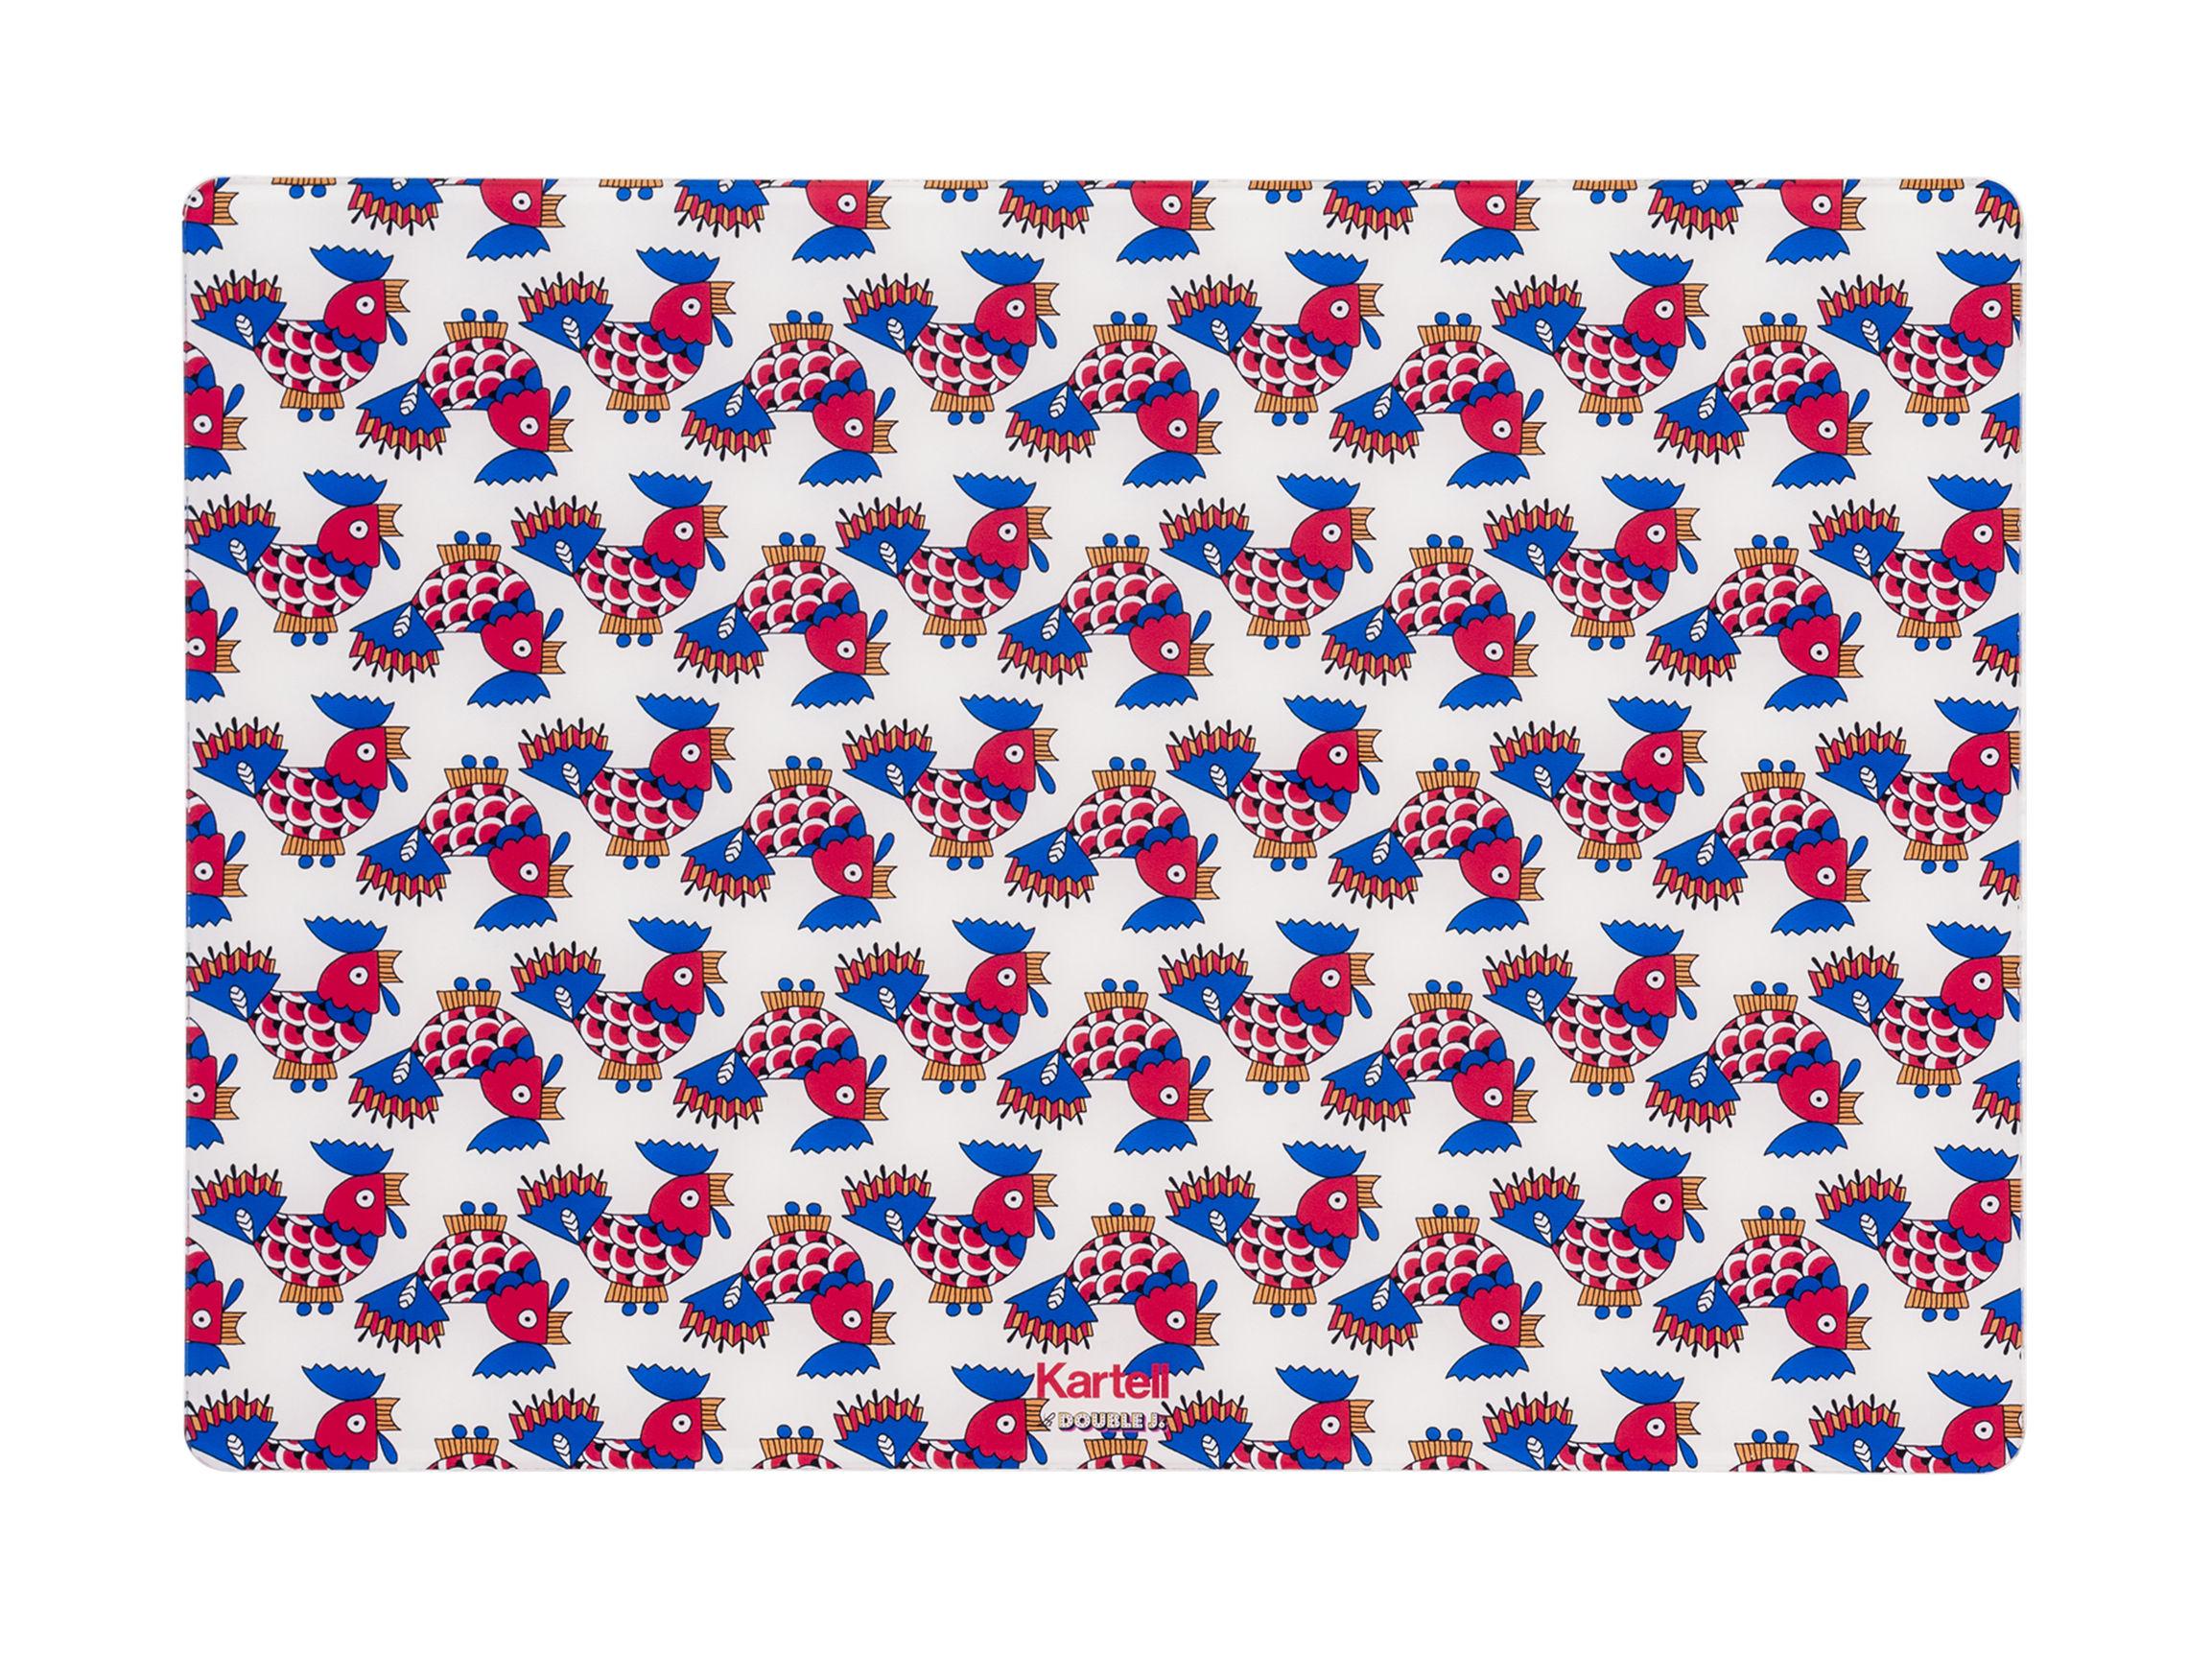 Starres Tischset L'Americana La Double J - / 42 x 30 cm - Galletti Kartell La Double J 1